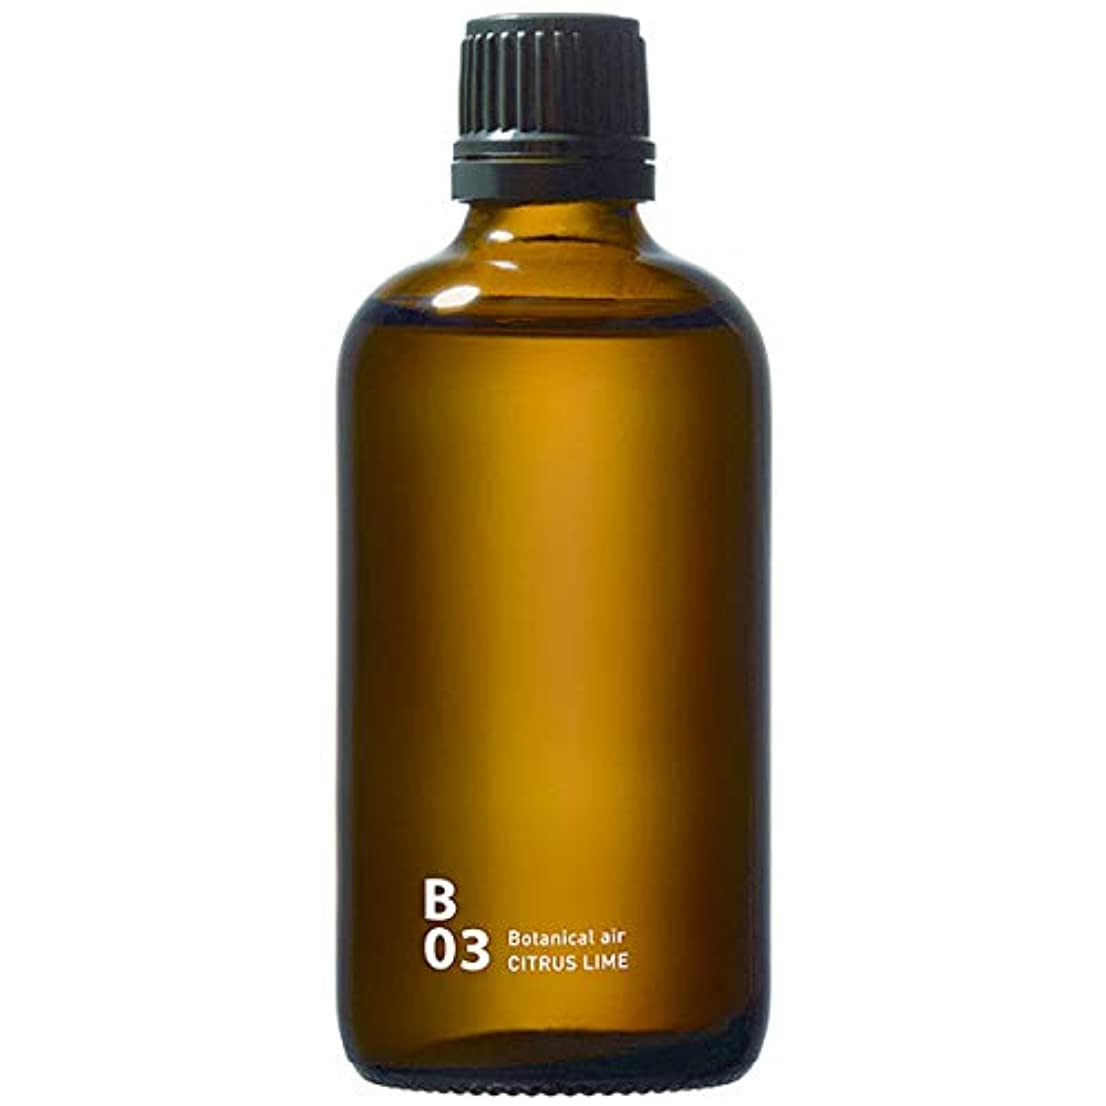 火山学者閉じる共同選択B03 CITRUS LIME piezo aroma oil 100ml